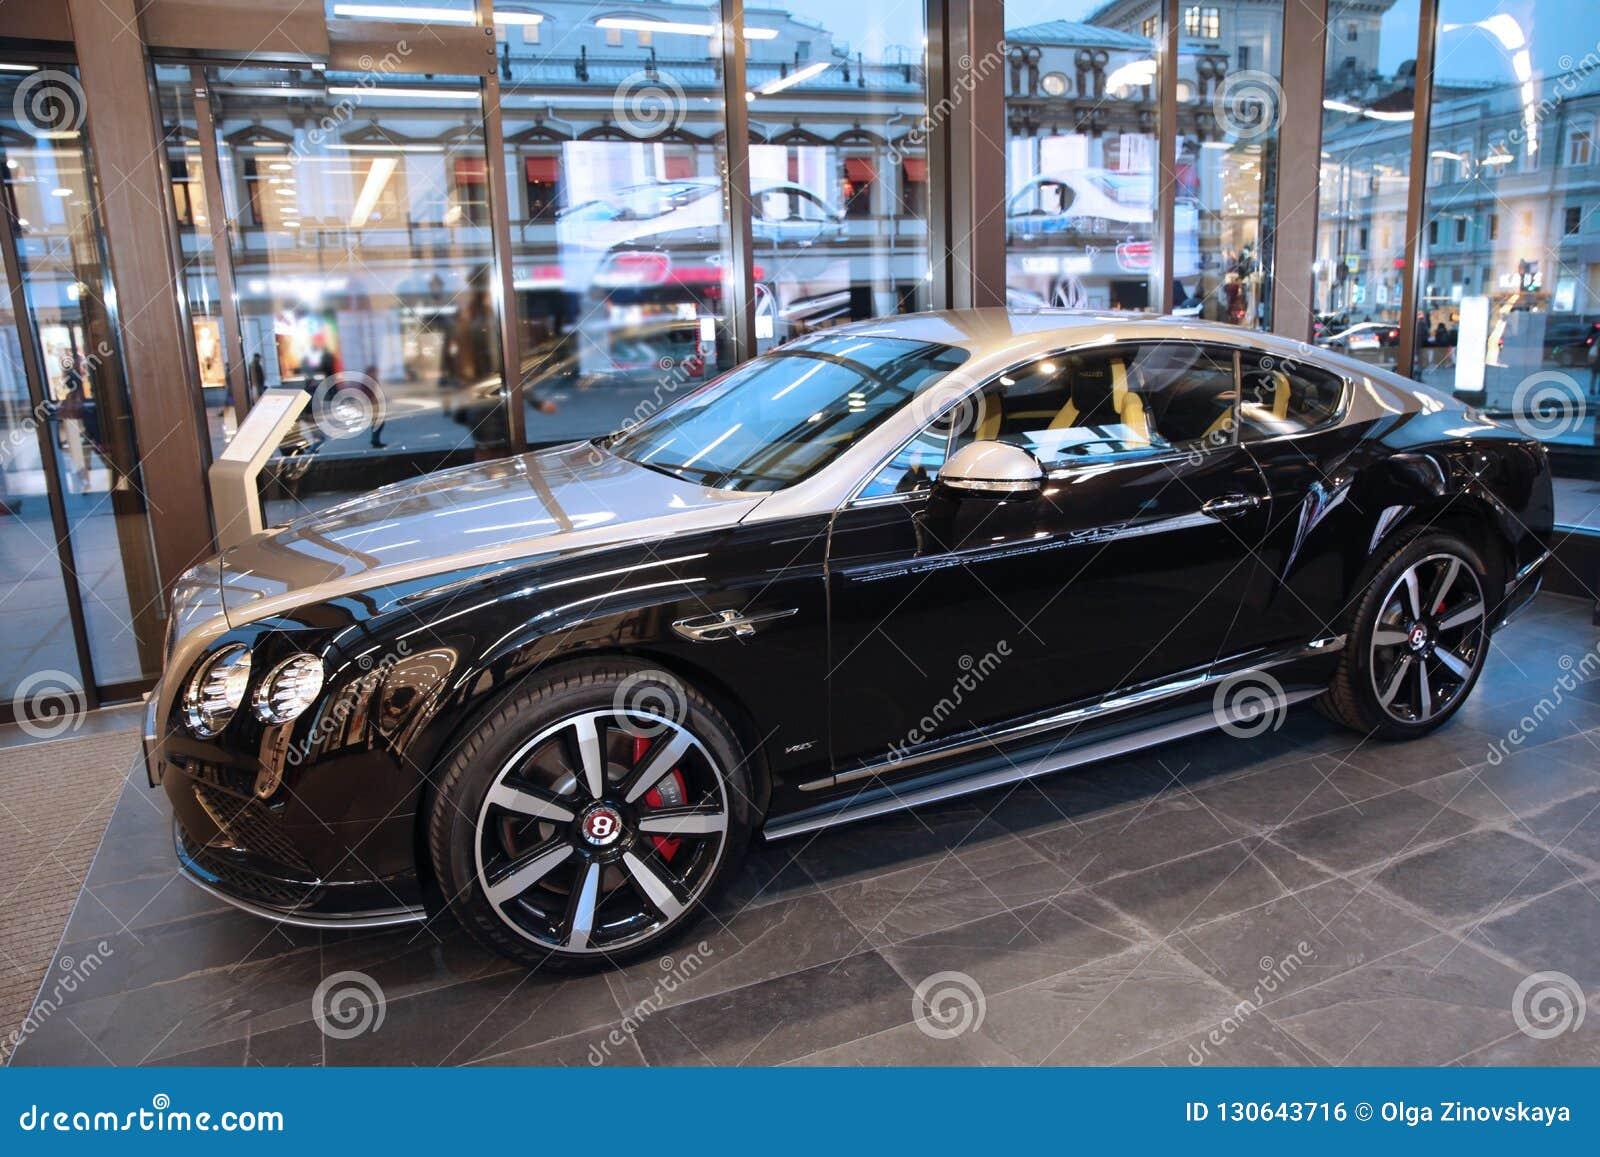 Nuevo Negro Del Modelo Del Coche Bentley De Plata Moscu Tsum 01 11 2018 Foto Editorial Imagen De 2018 Moscu 130643716